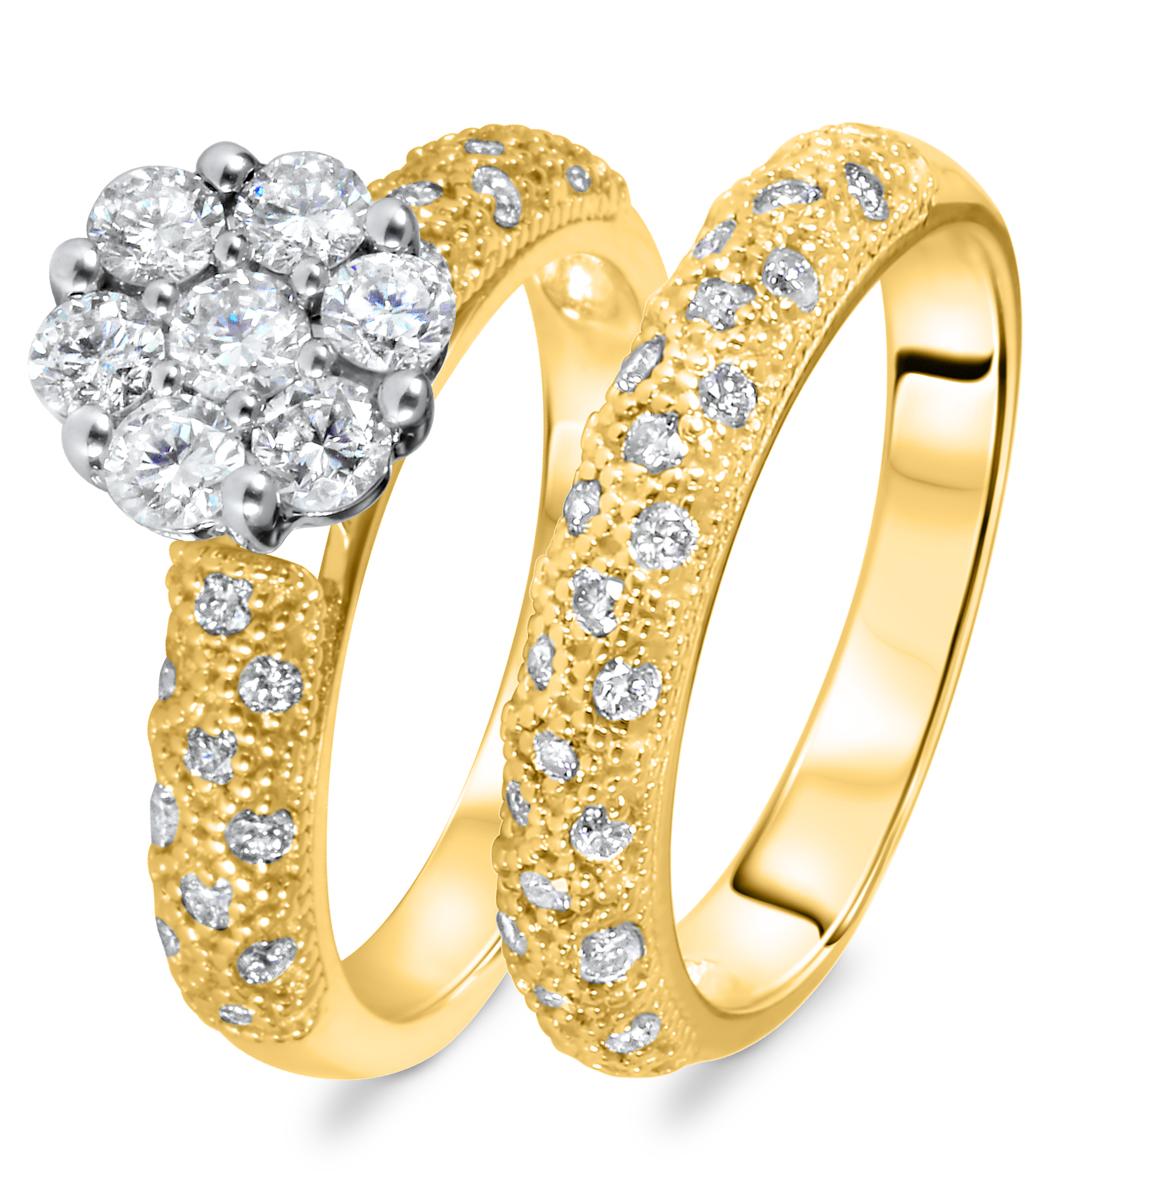 1 1/10 CT. T.W. Diamond Women's Bridal Wedding Ring Set 10K Yellow Gold